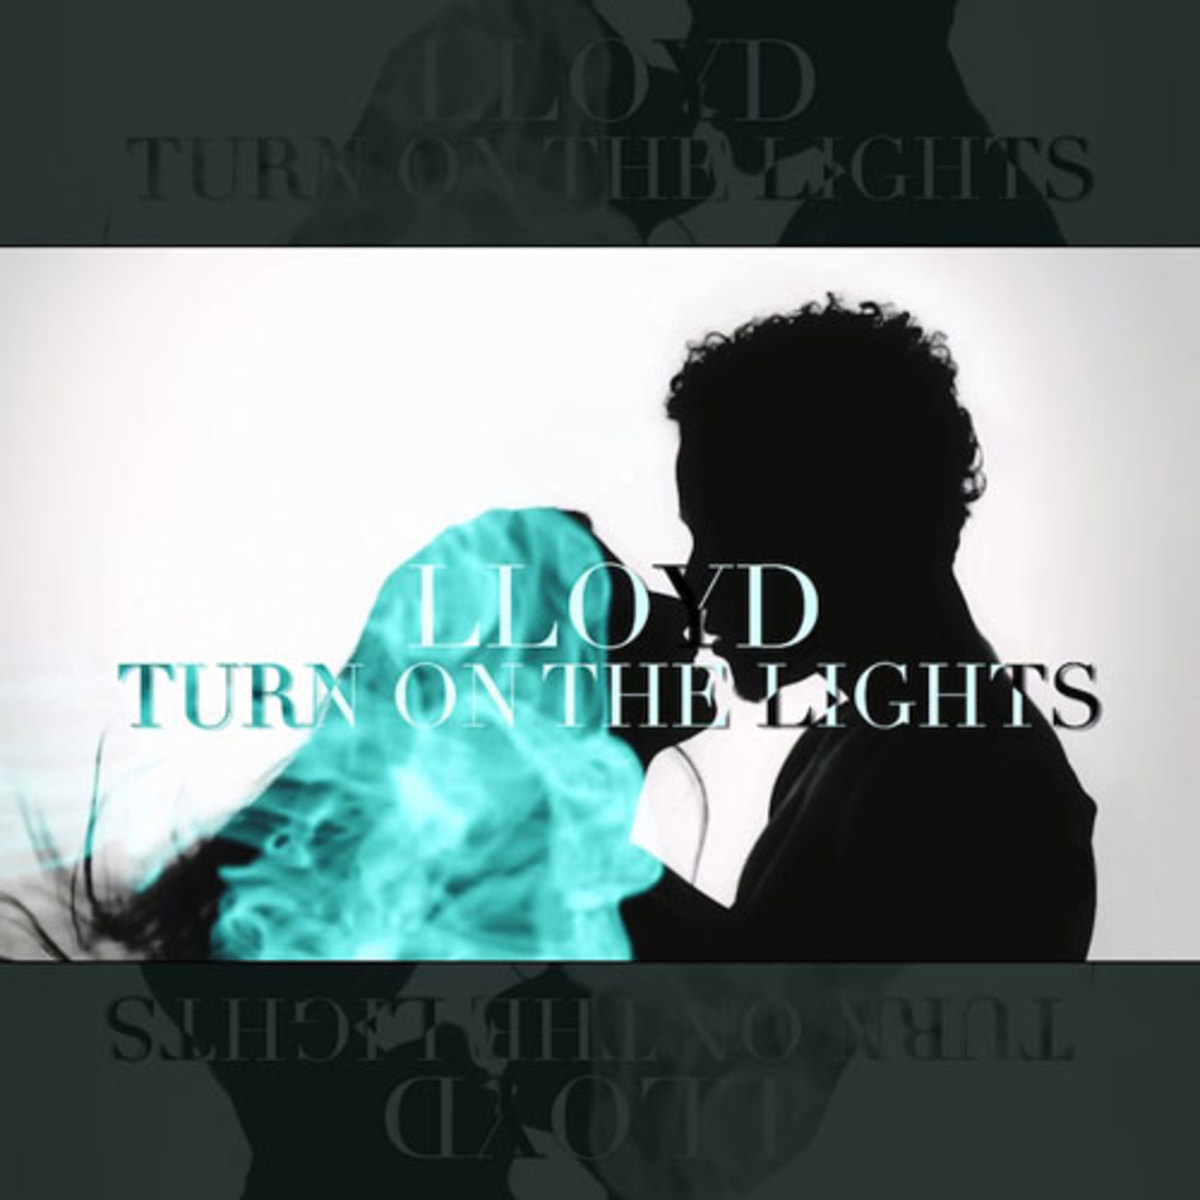 lloyd-turnonthelights.jpg